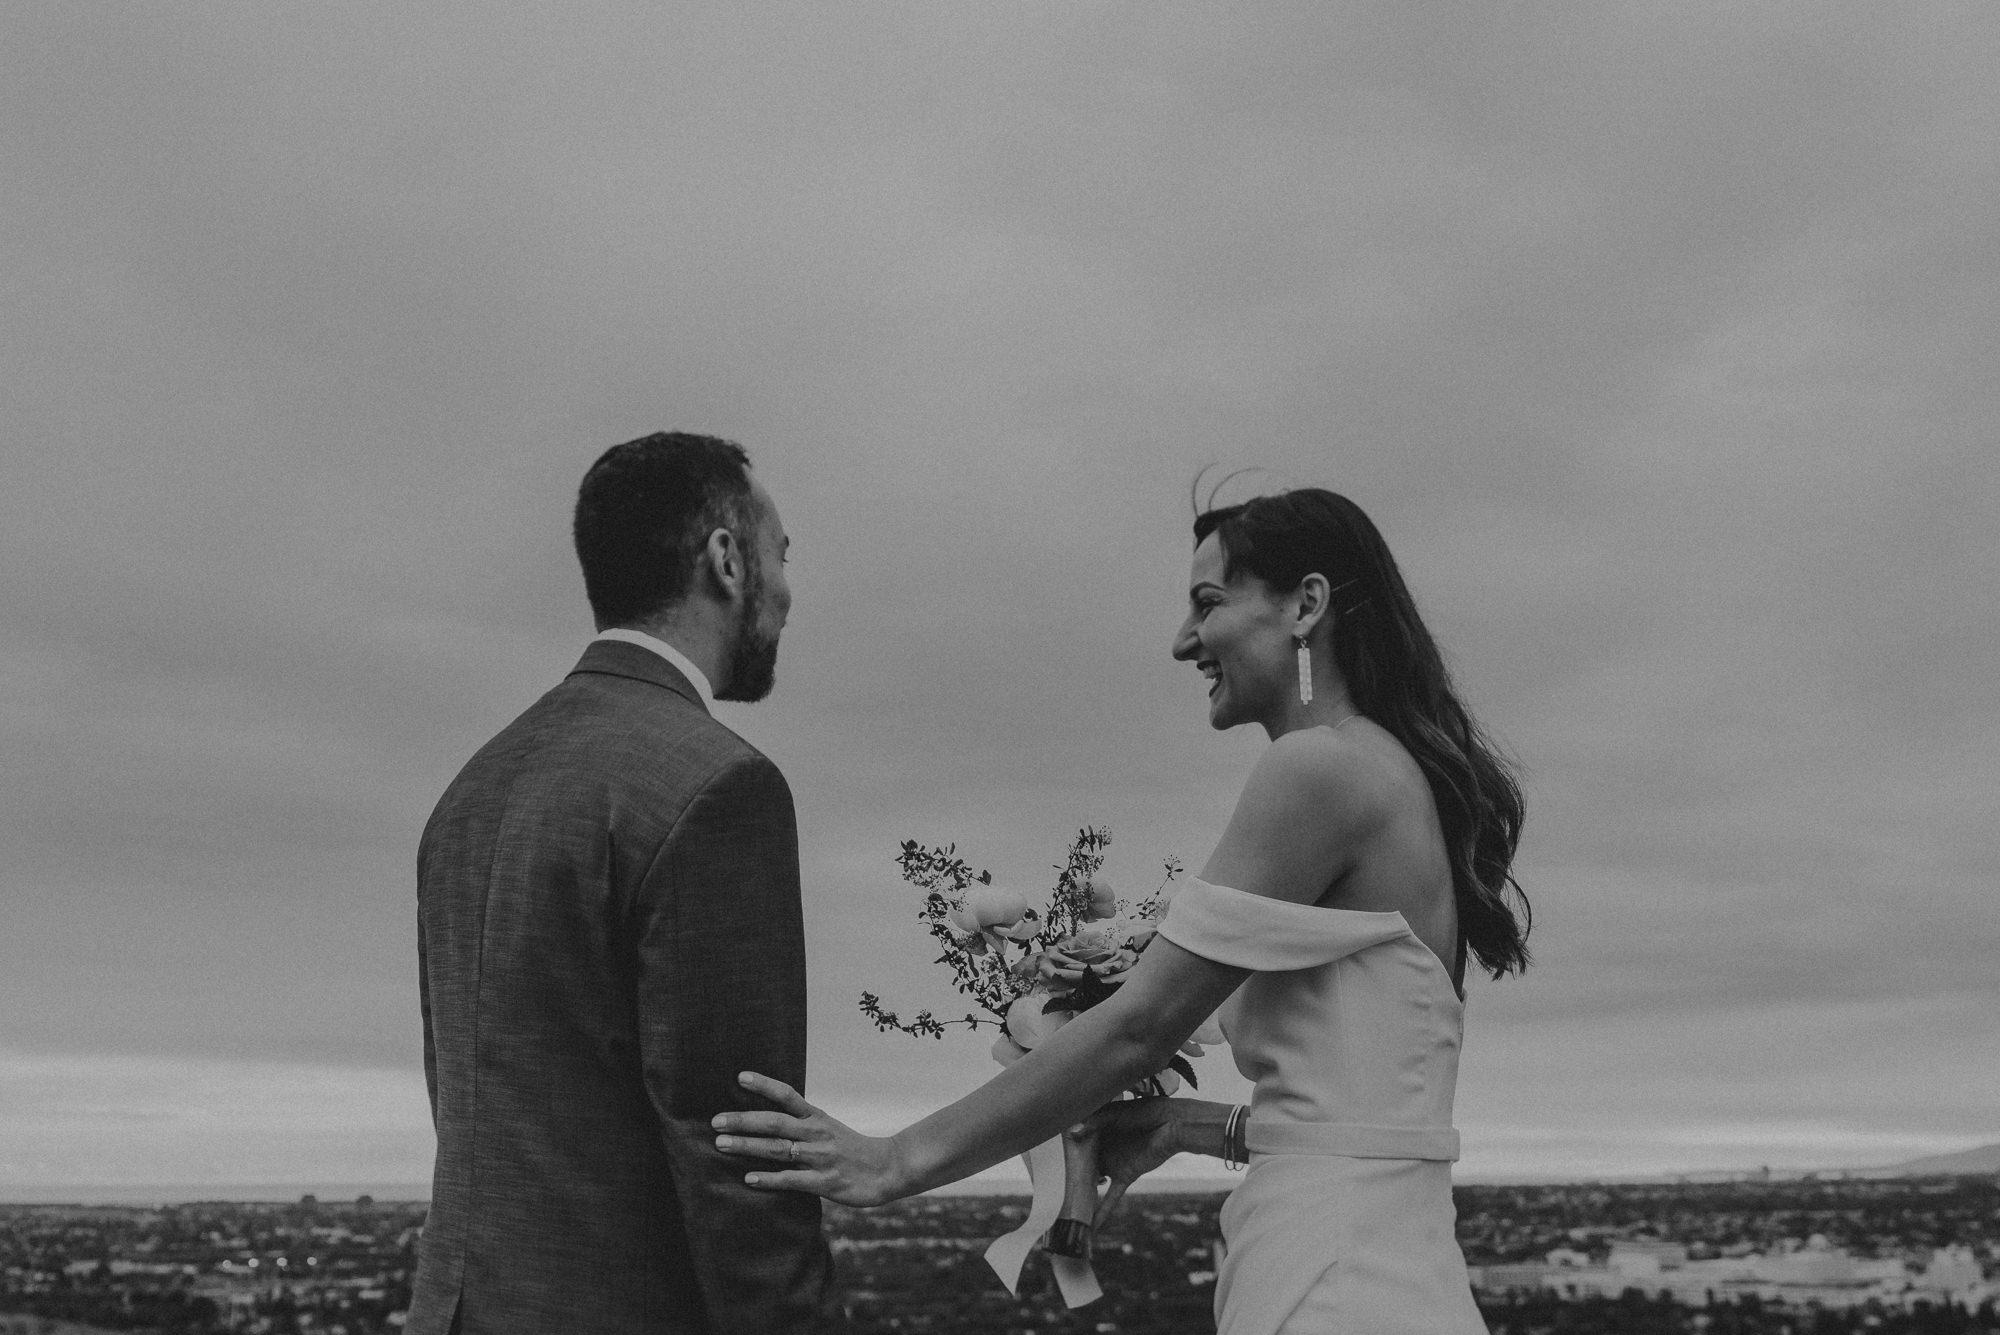 elopement photographer in los angeles - la wedding photographer - isaiahandtaylor.com-041.jpg